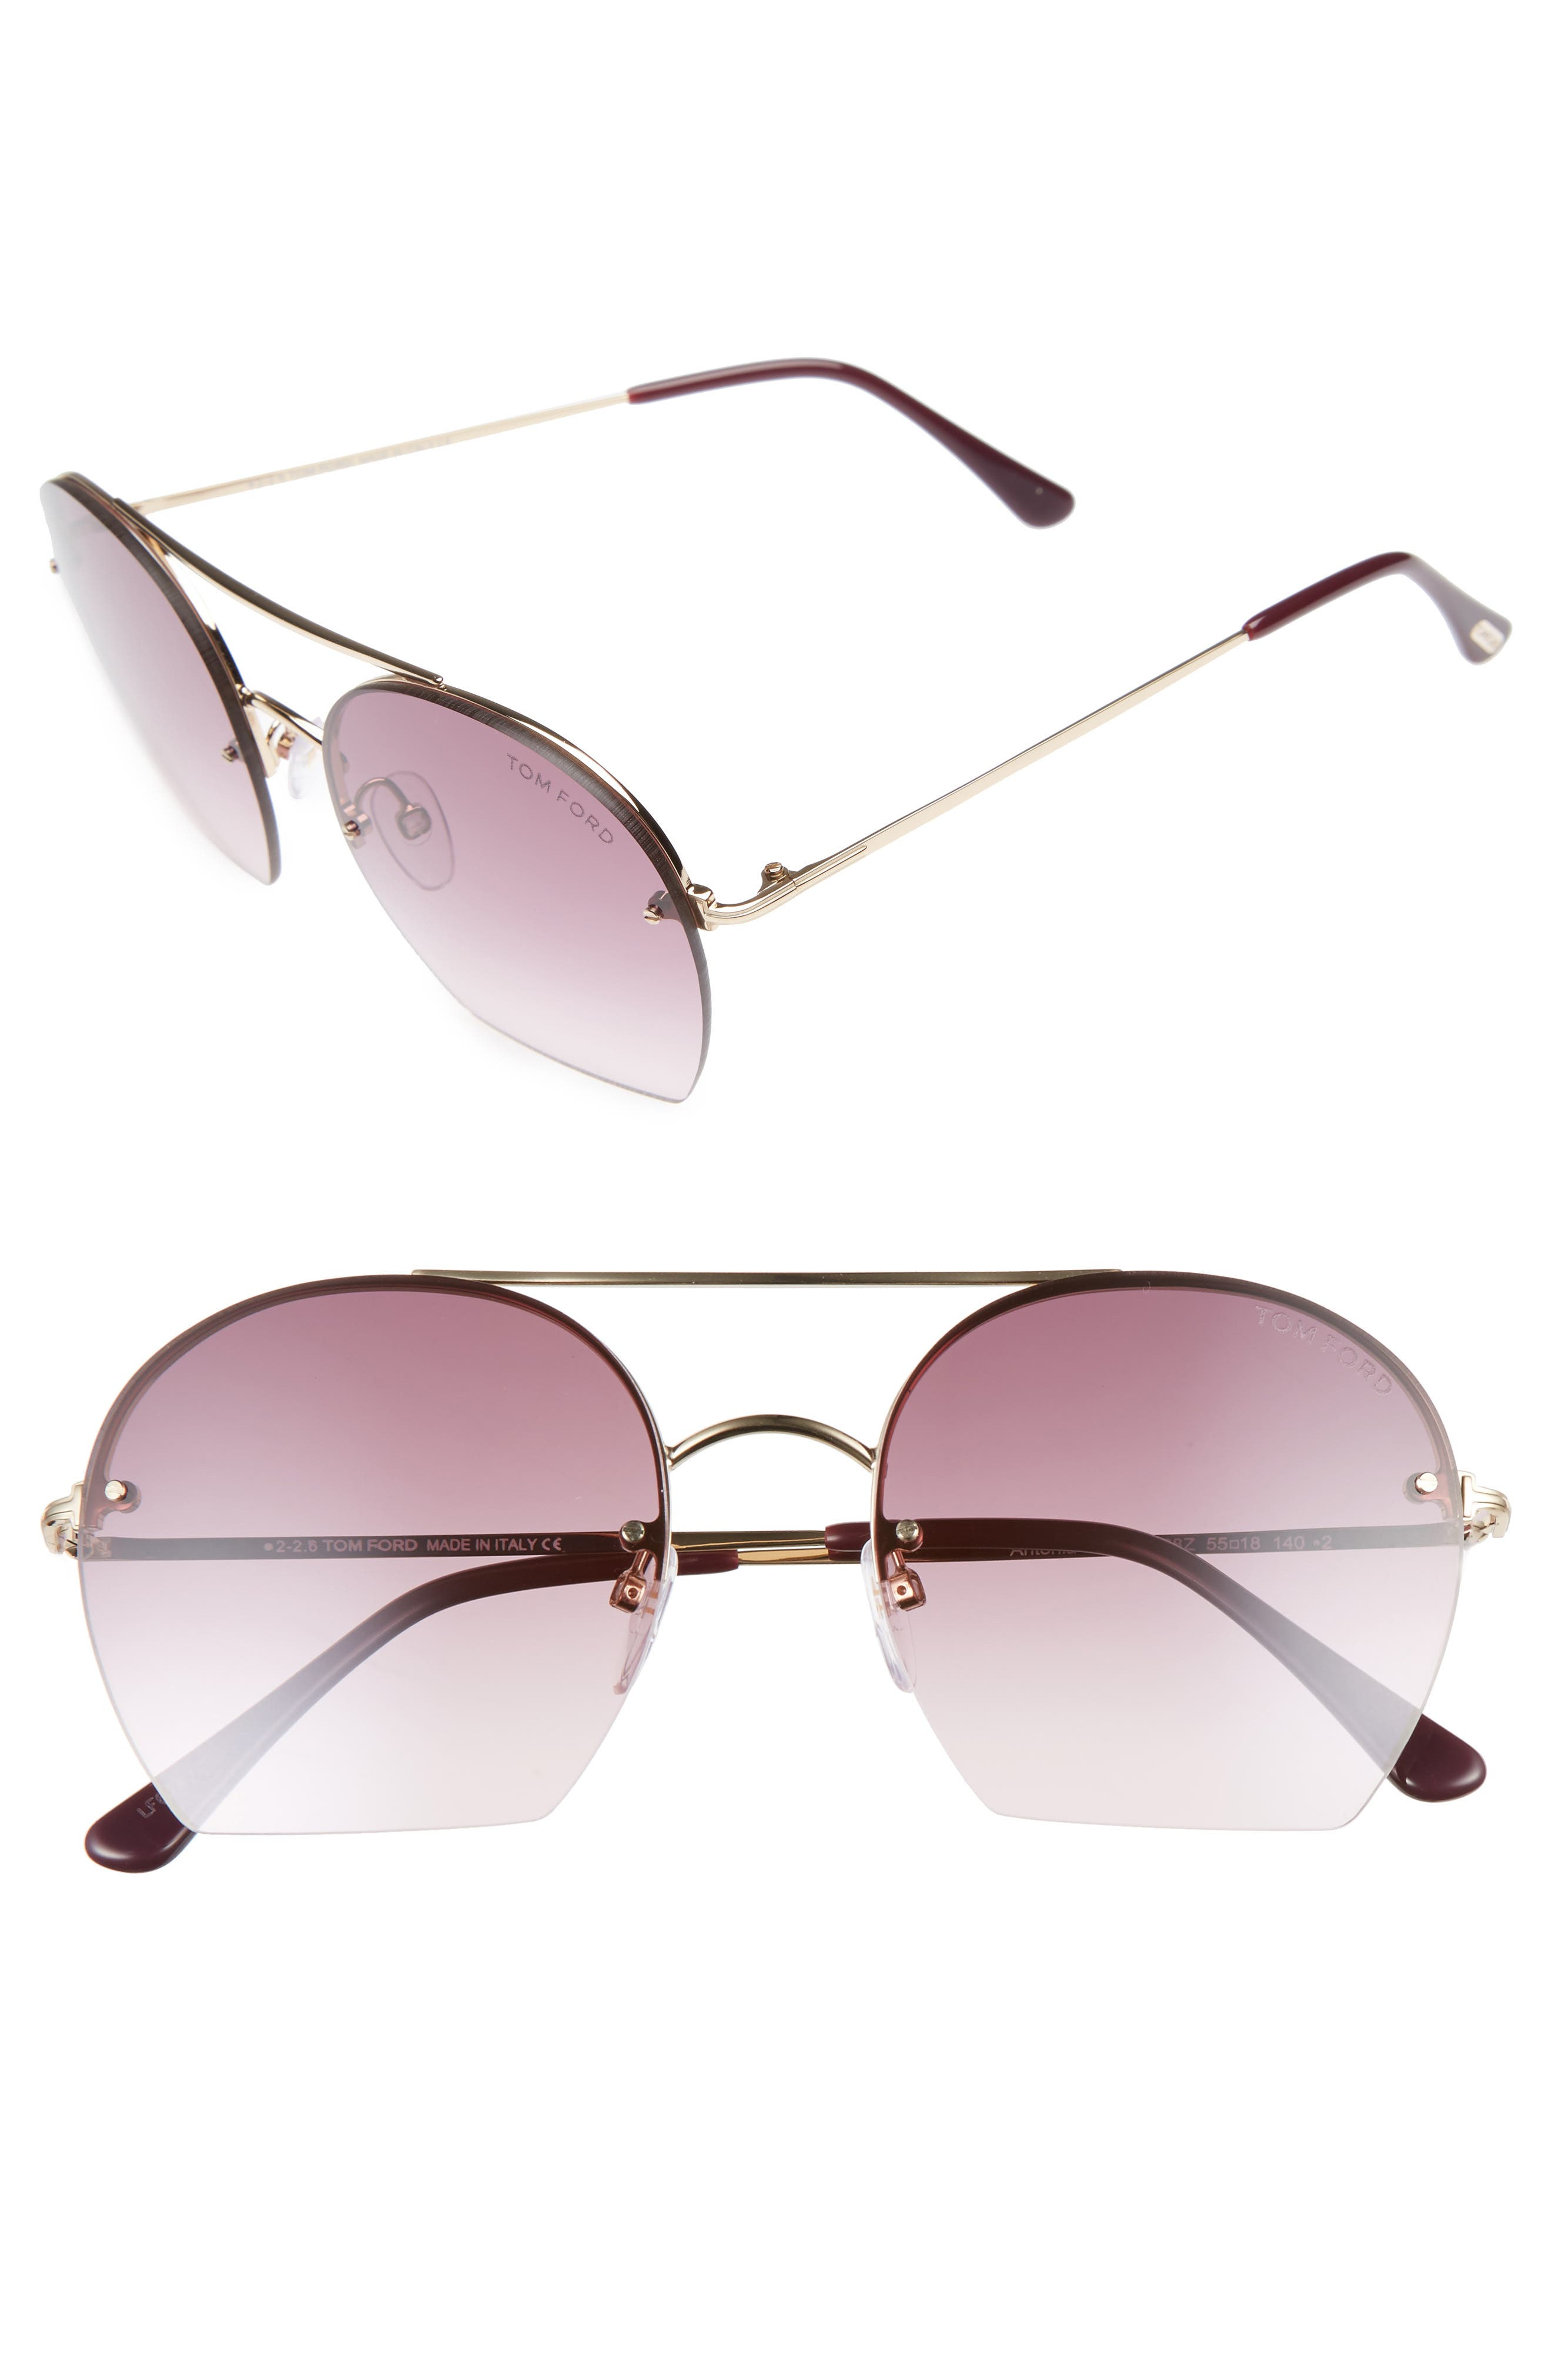 Tom Ford Antonia 55mm Gradient Lens Aviator Sunglasses